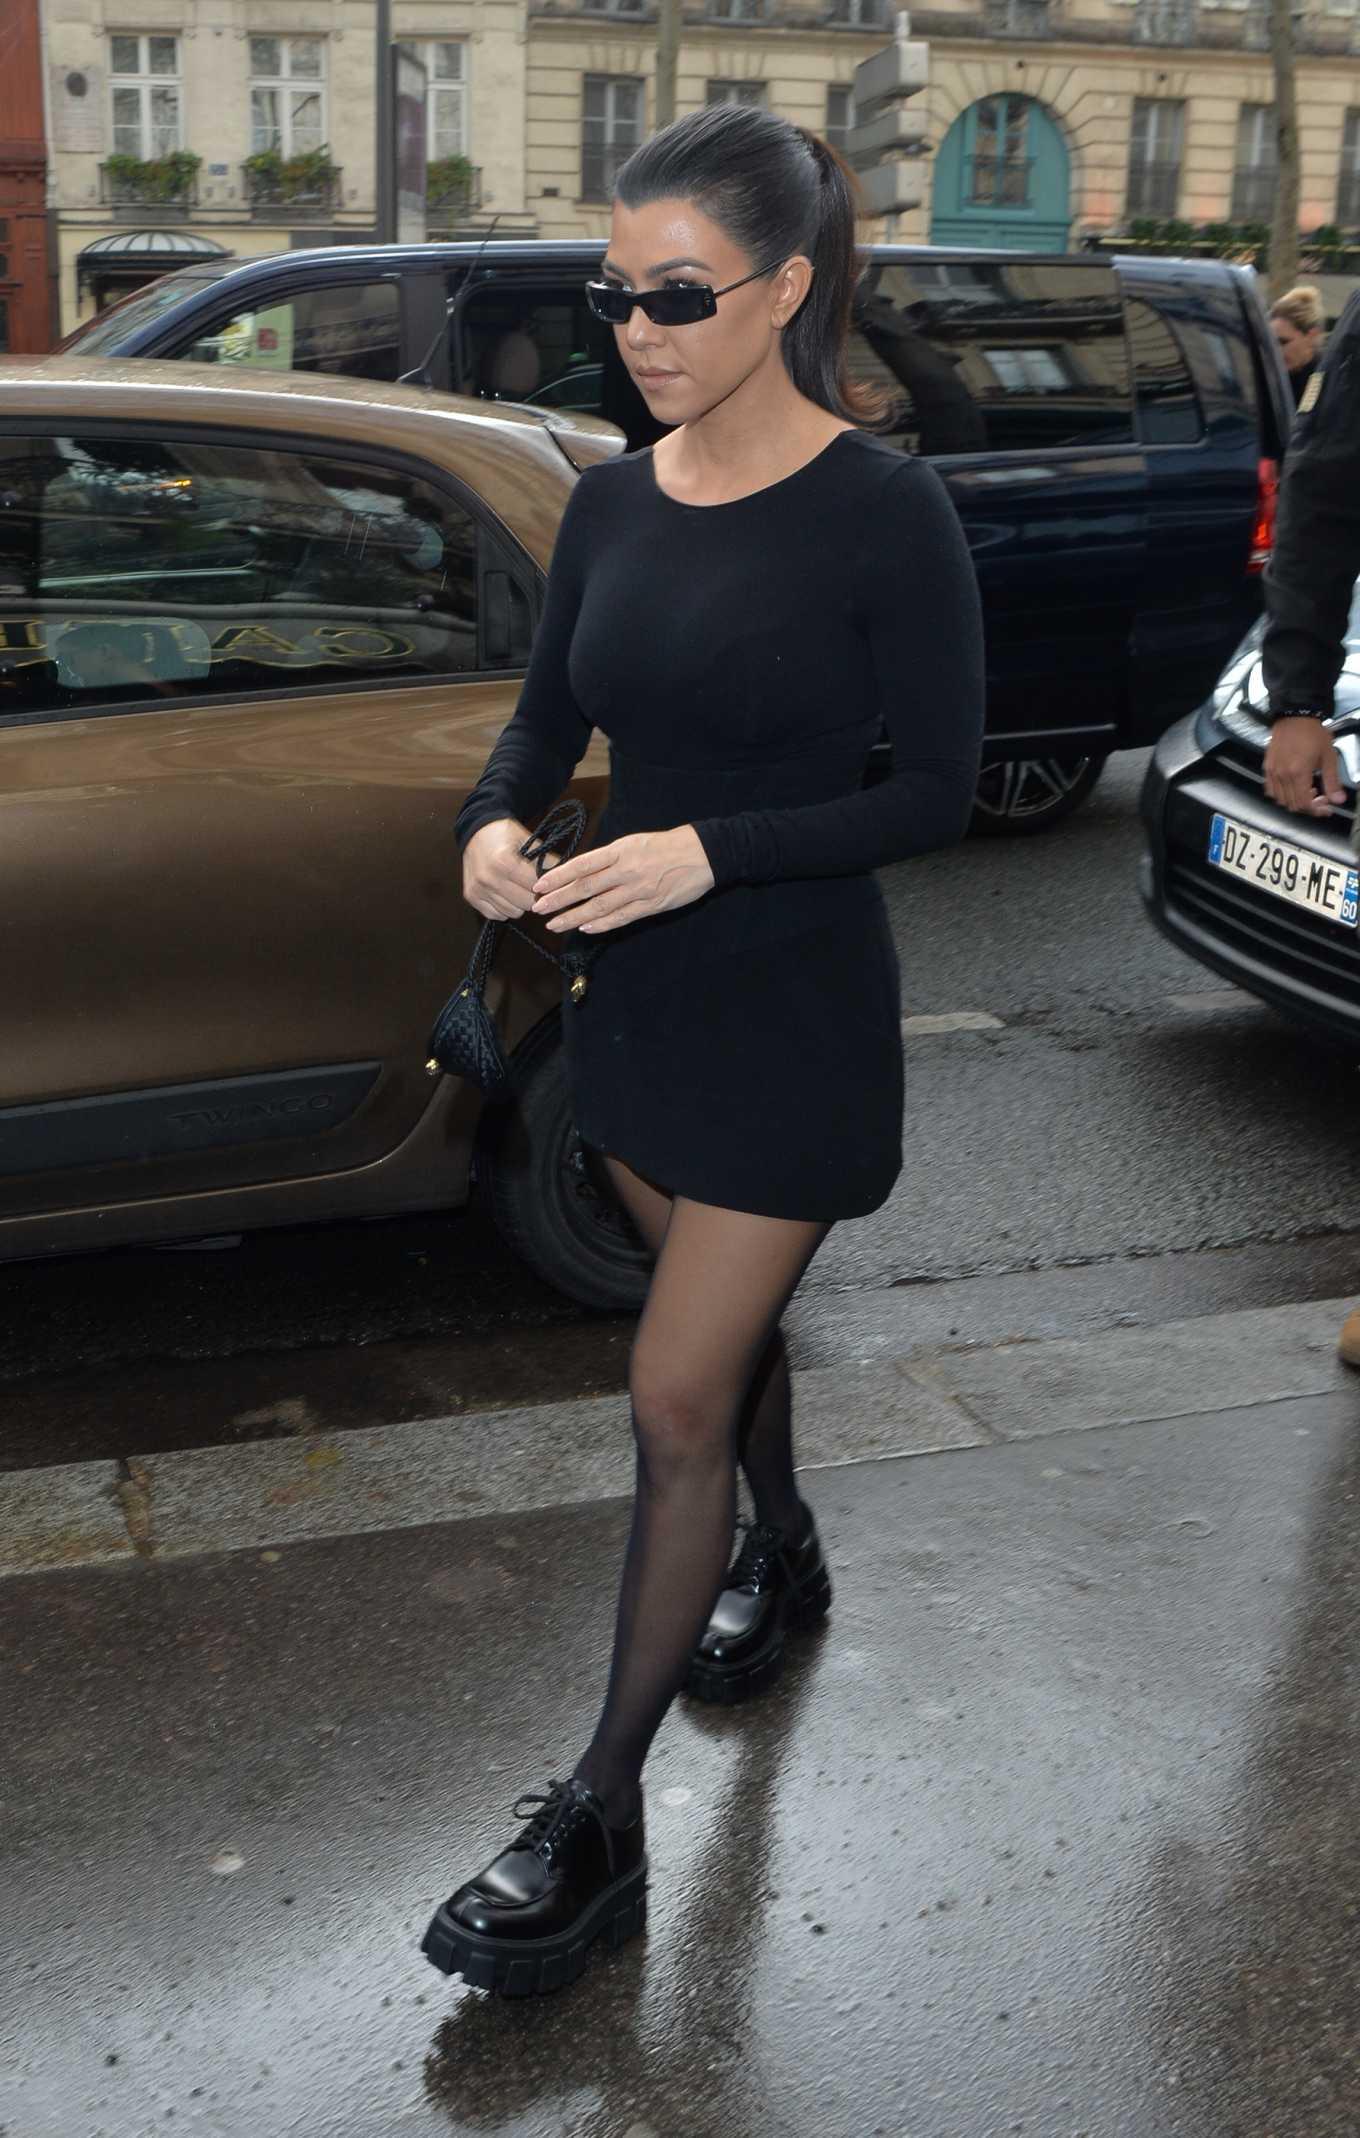 Kourtney Kardashian in Black Mini Dress - Out and about in Paris